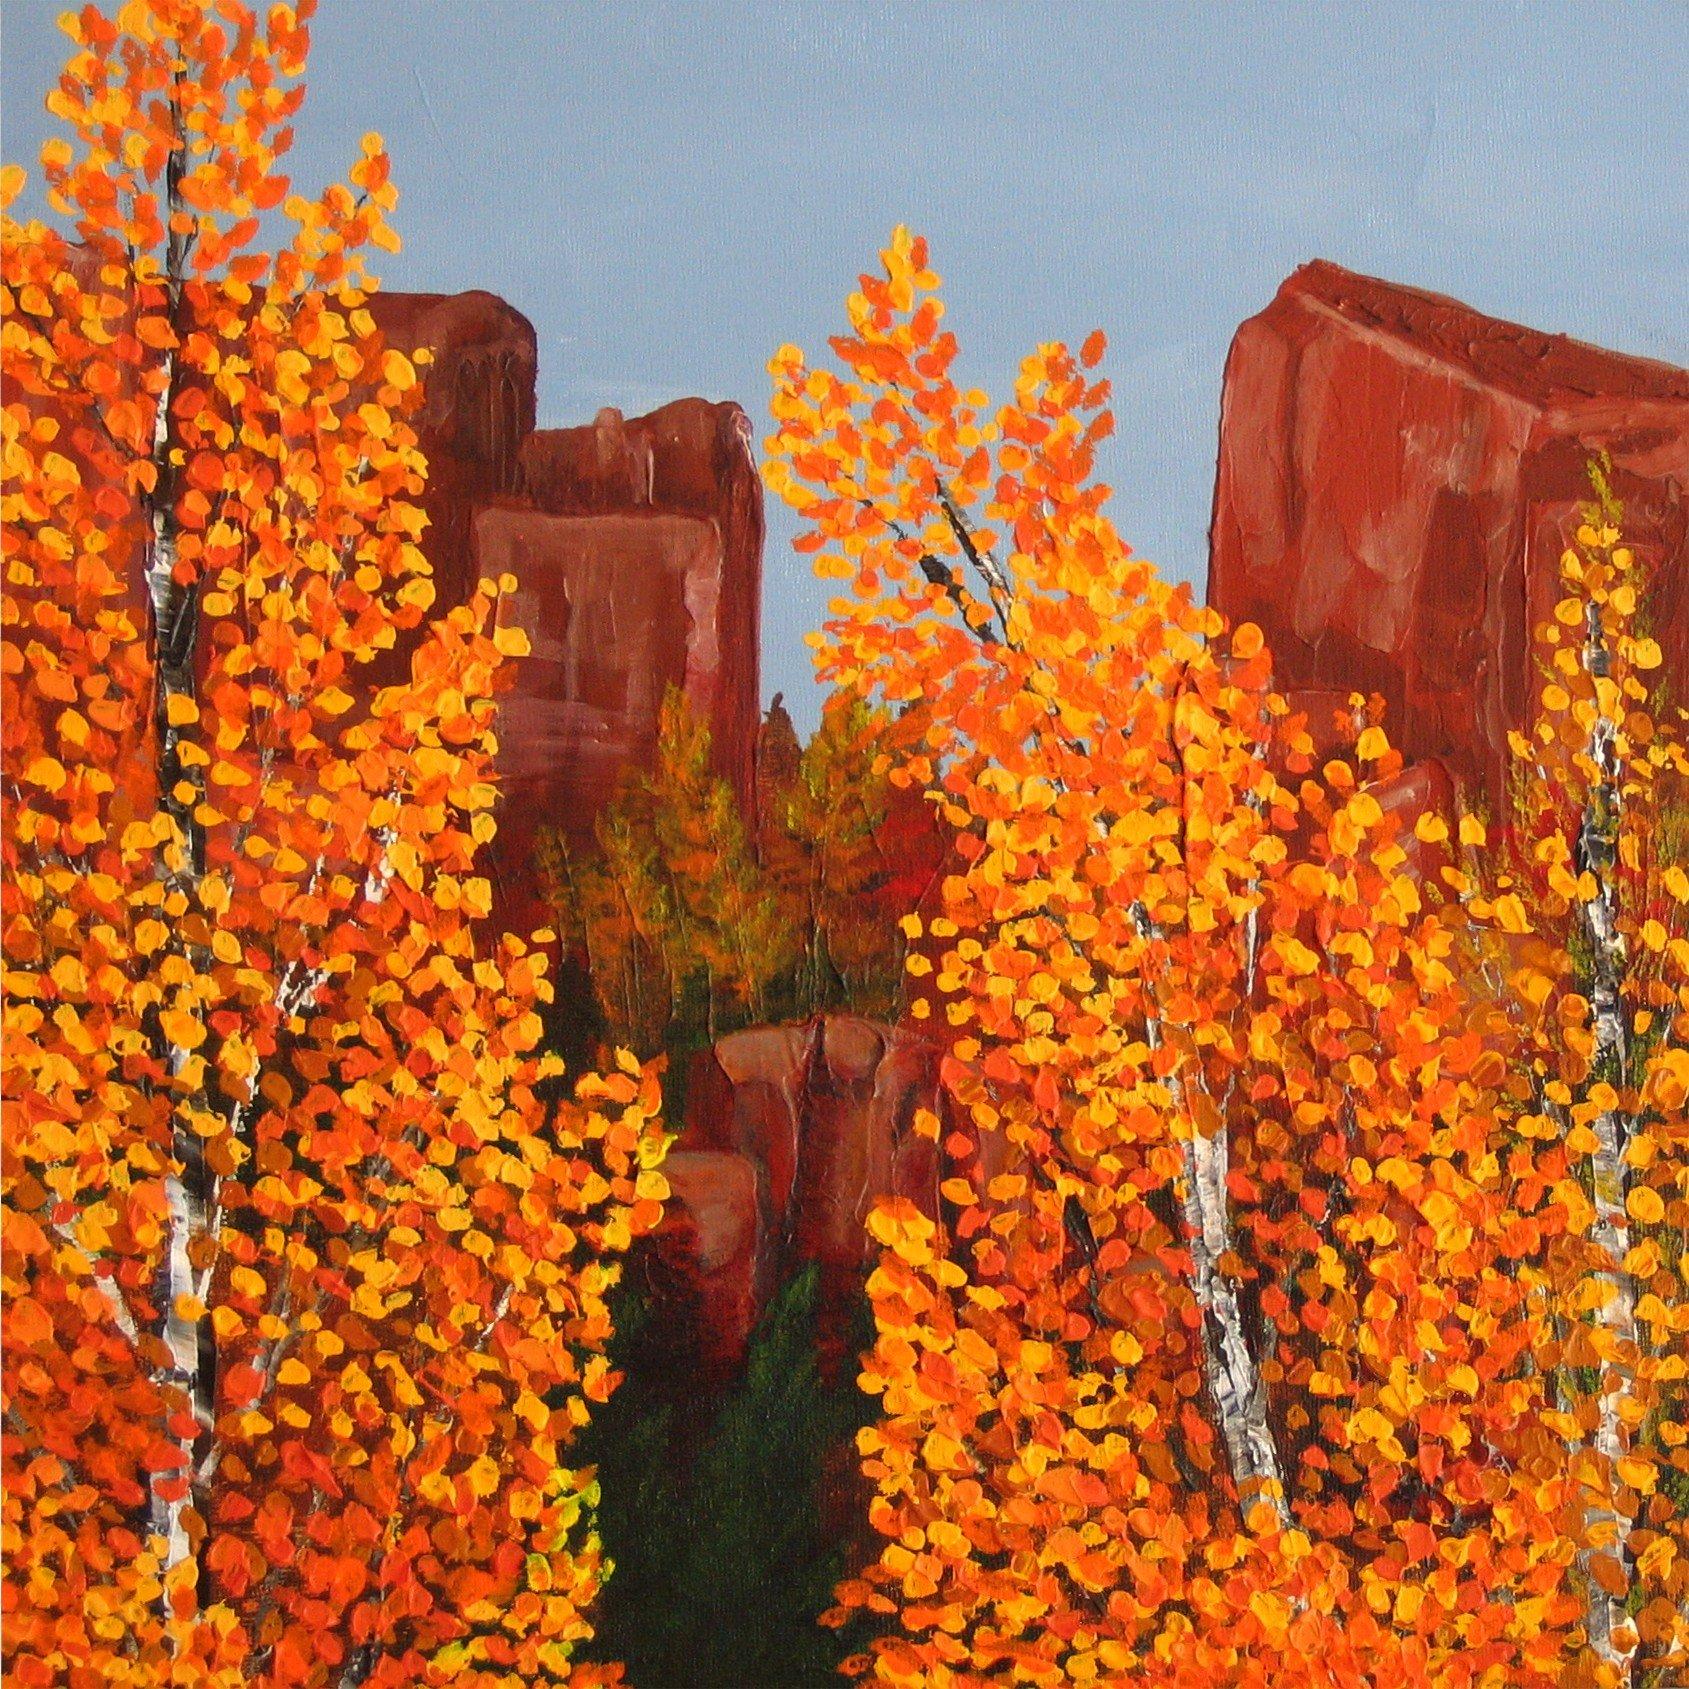 Southwest in Autumn